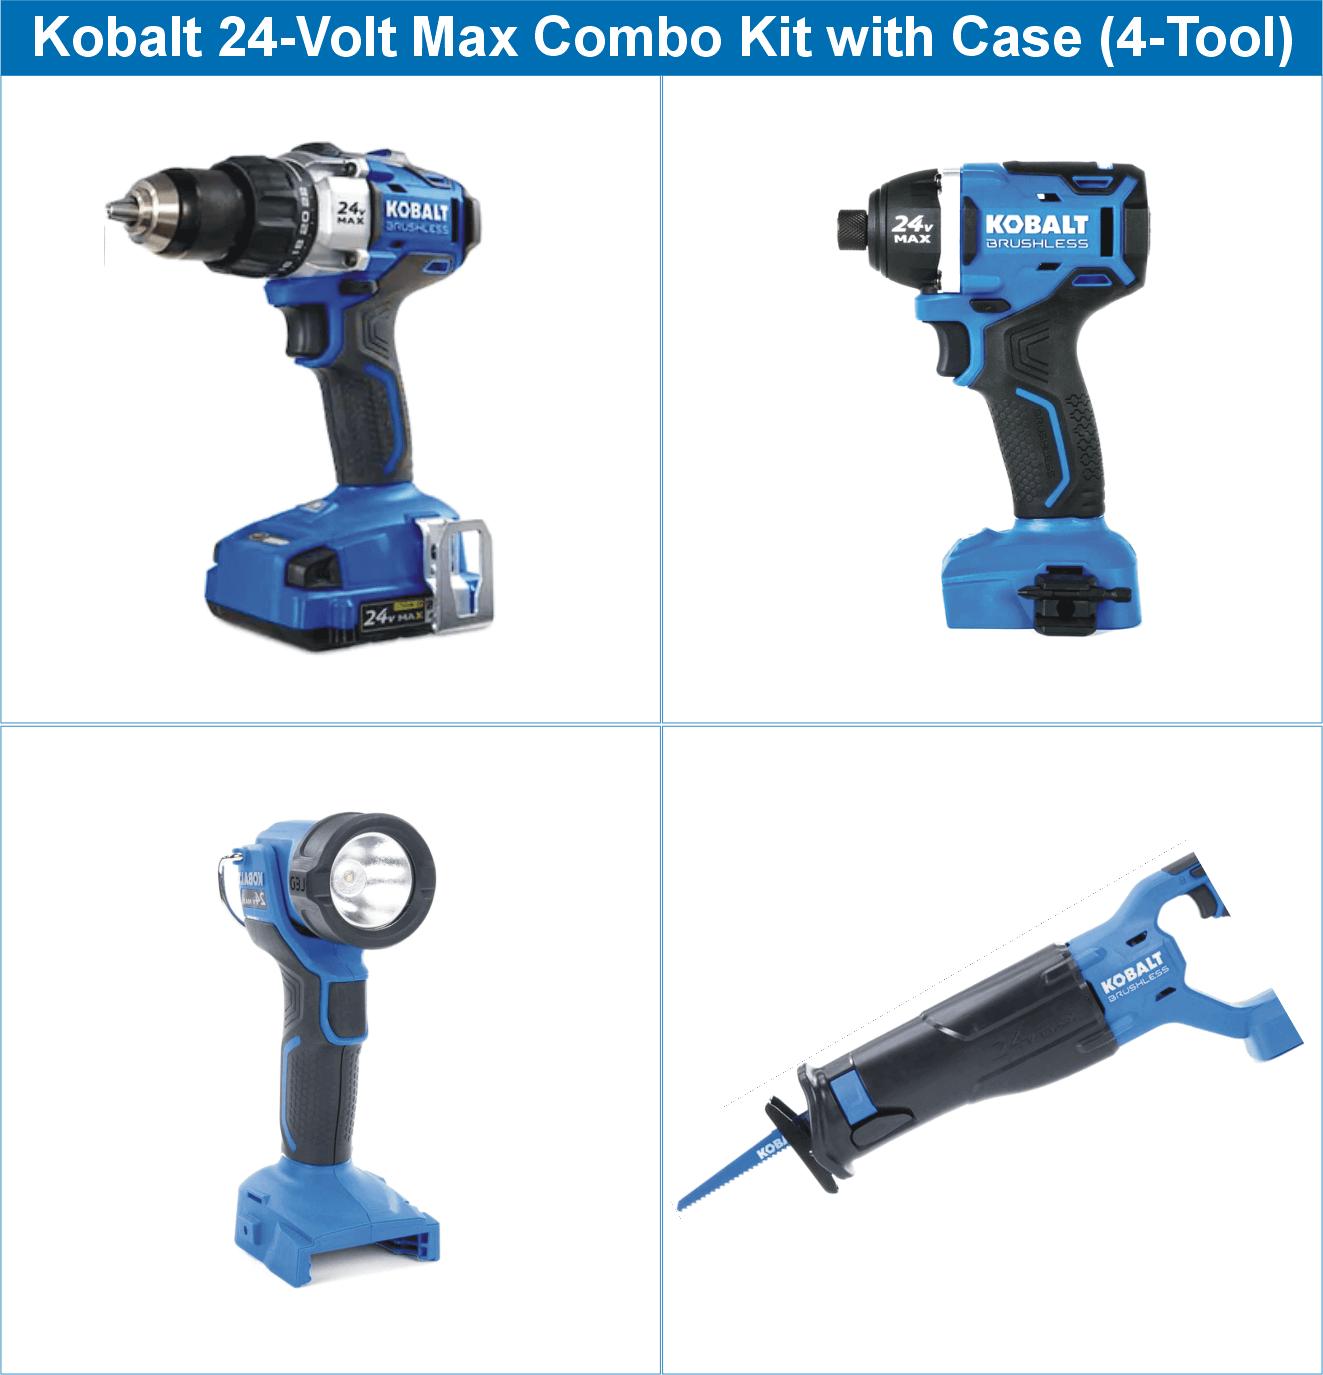 kobalt-24-volt-max-combo-kit-with-case-4-tool